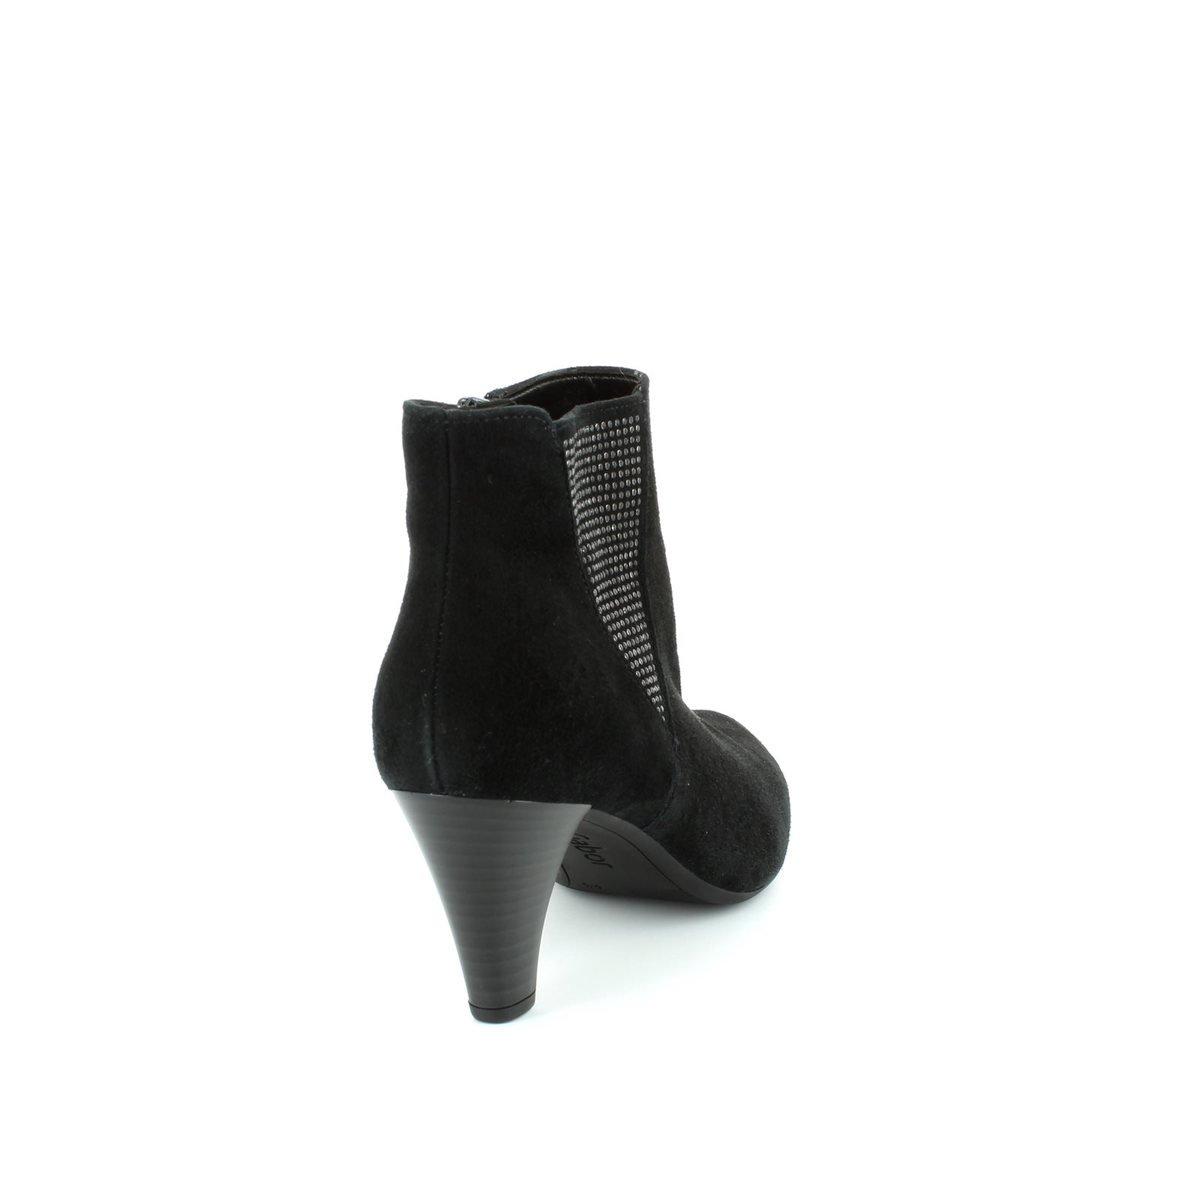 Gabor Ladies Ankle Boots 31.701.17 Black